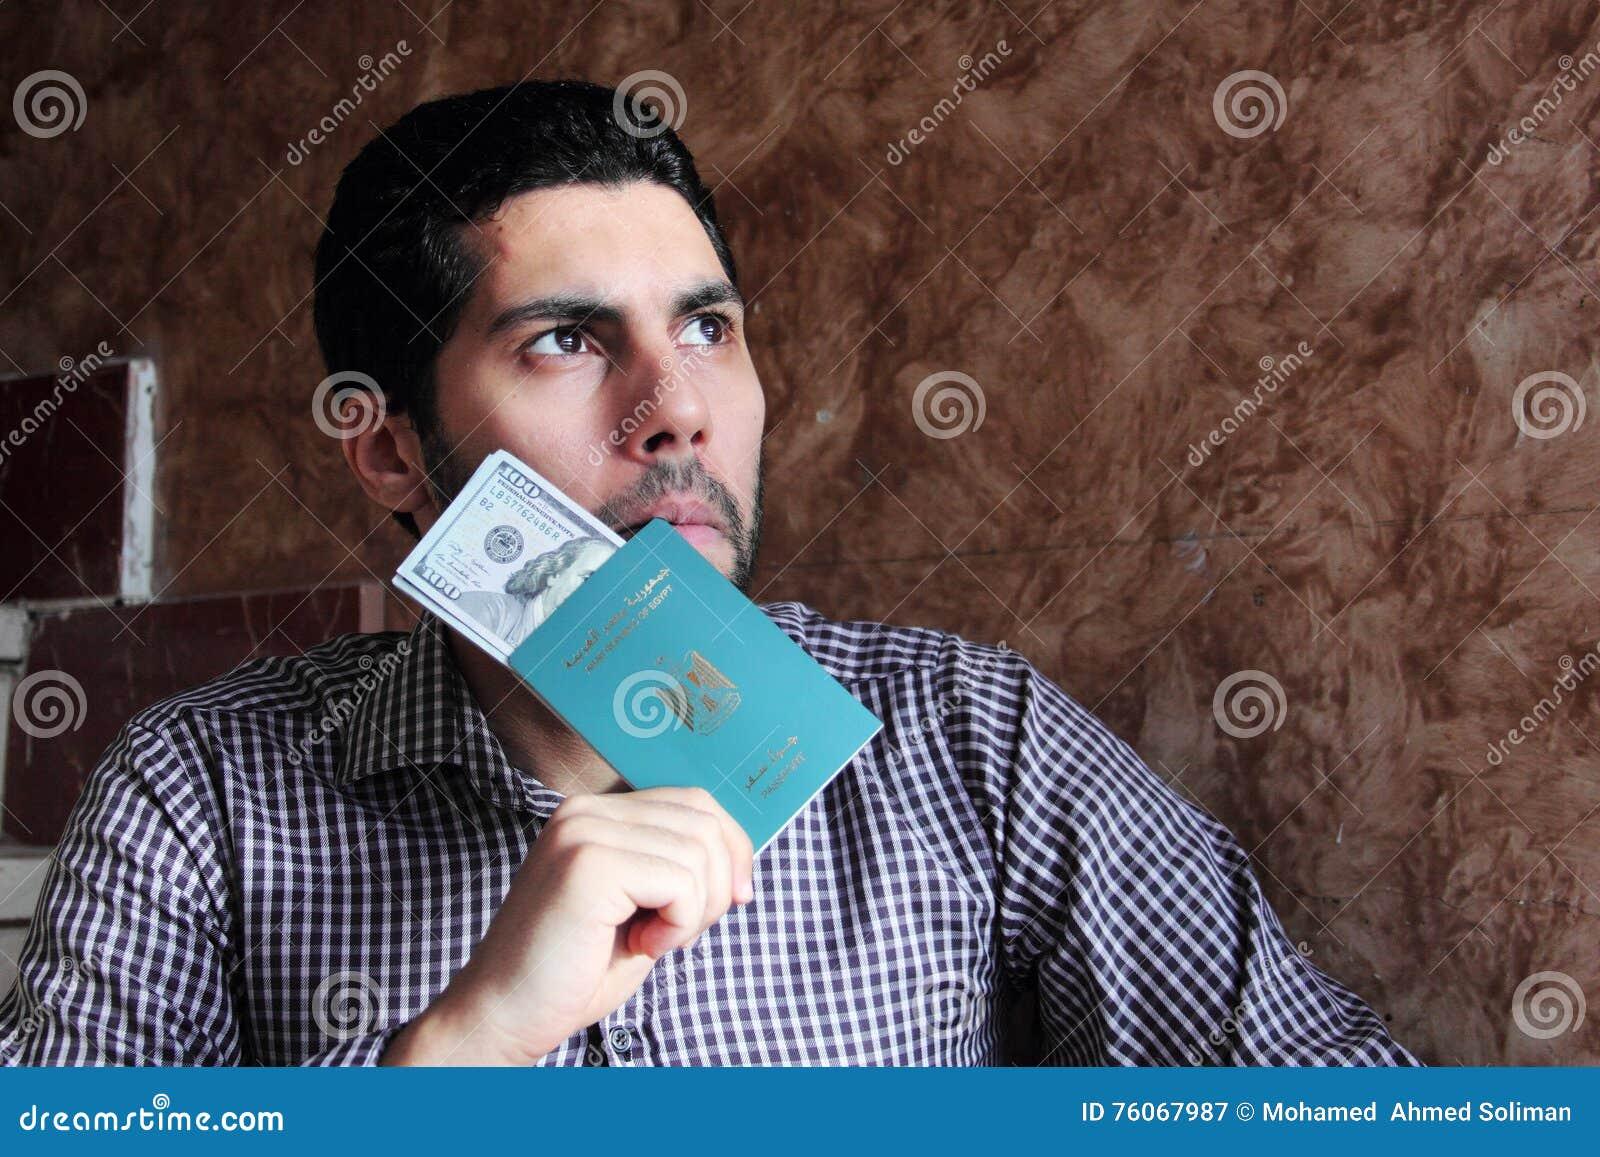 Arab muslim man with egypt passport with money